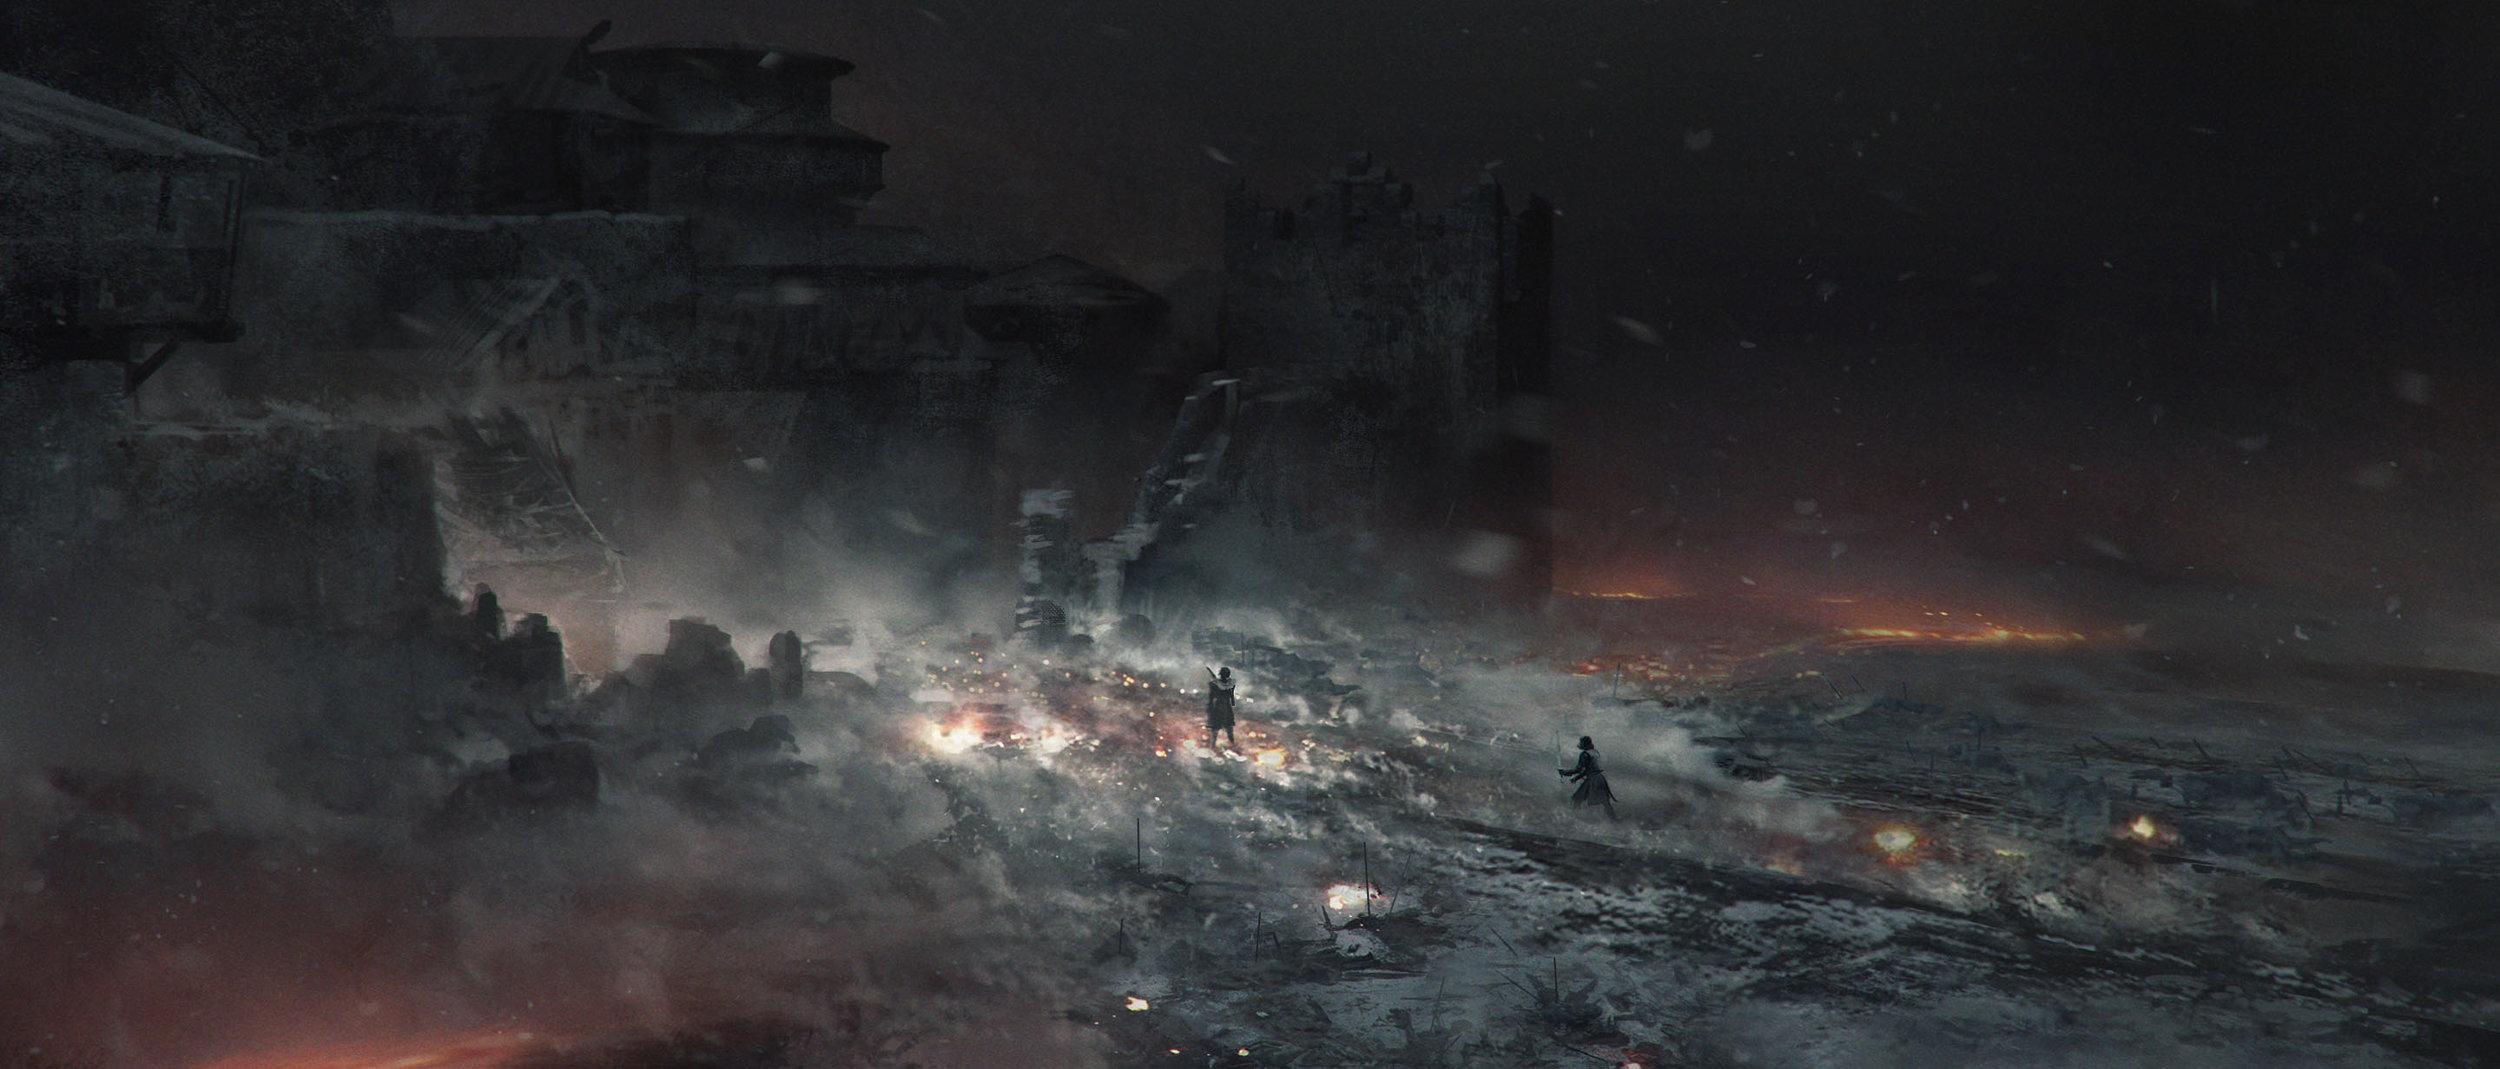 GOT8_Winterfell_Walls_Breached_skt_012_BB_ps.JPG